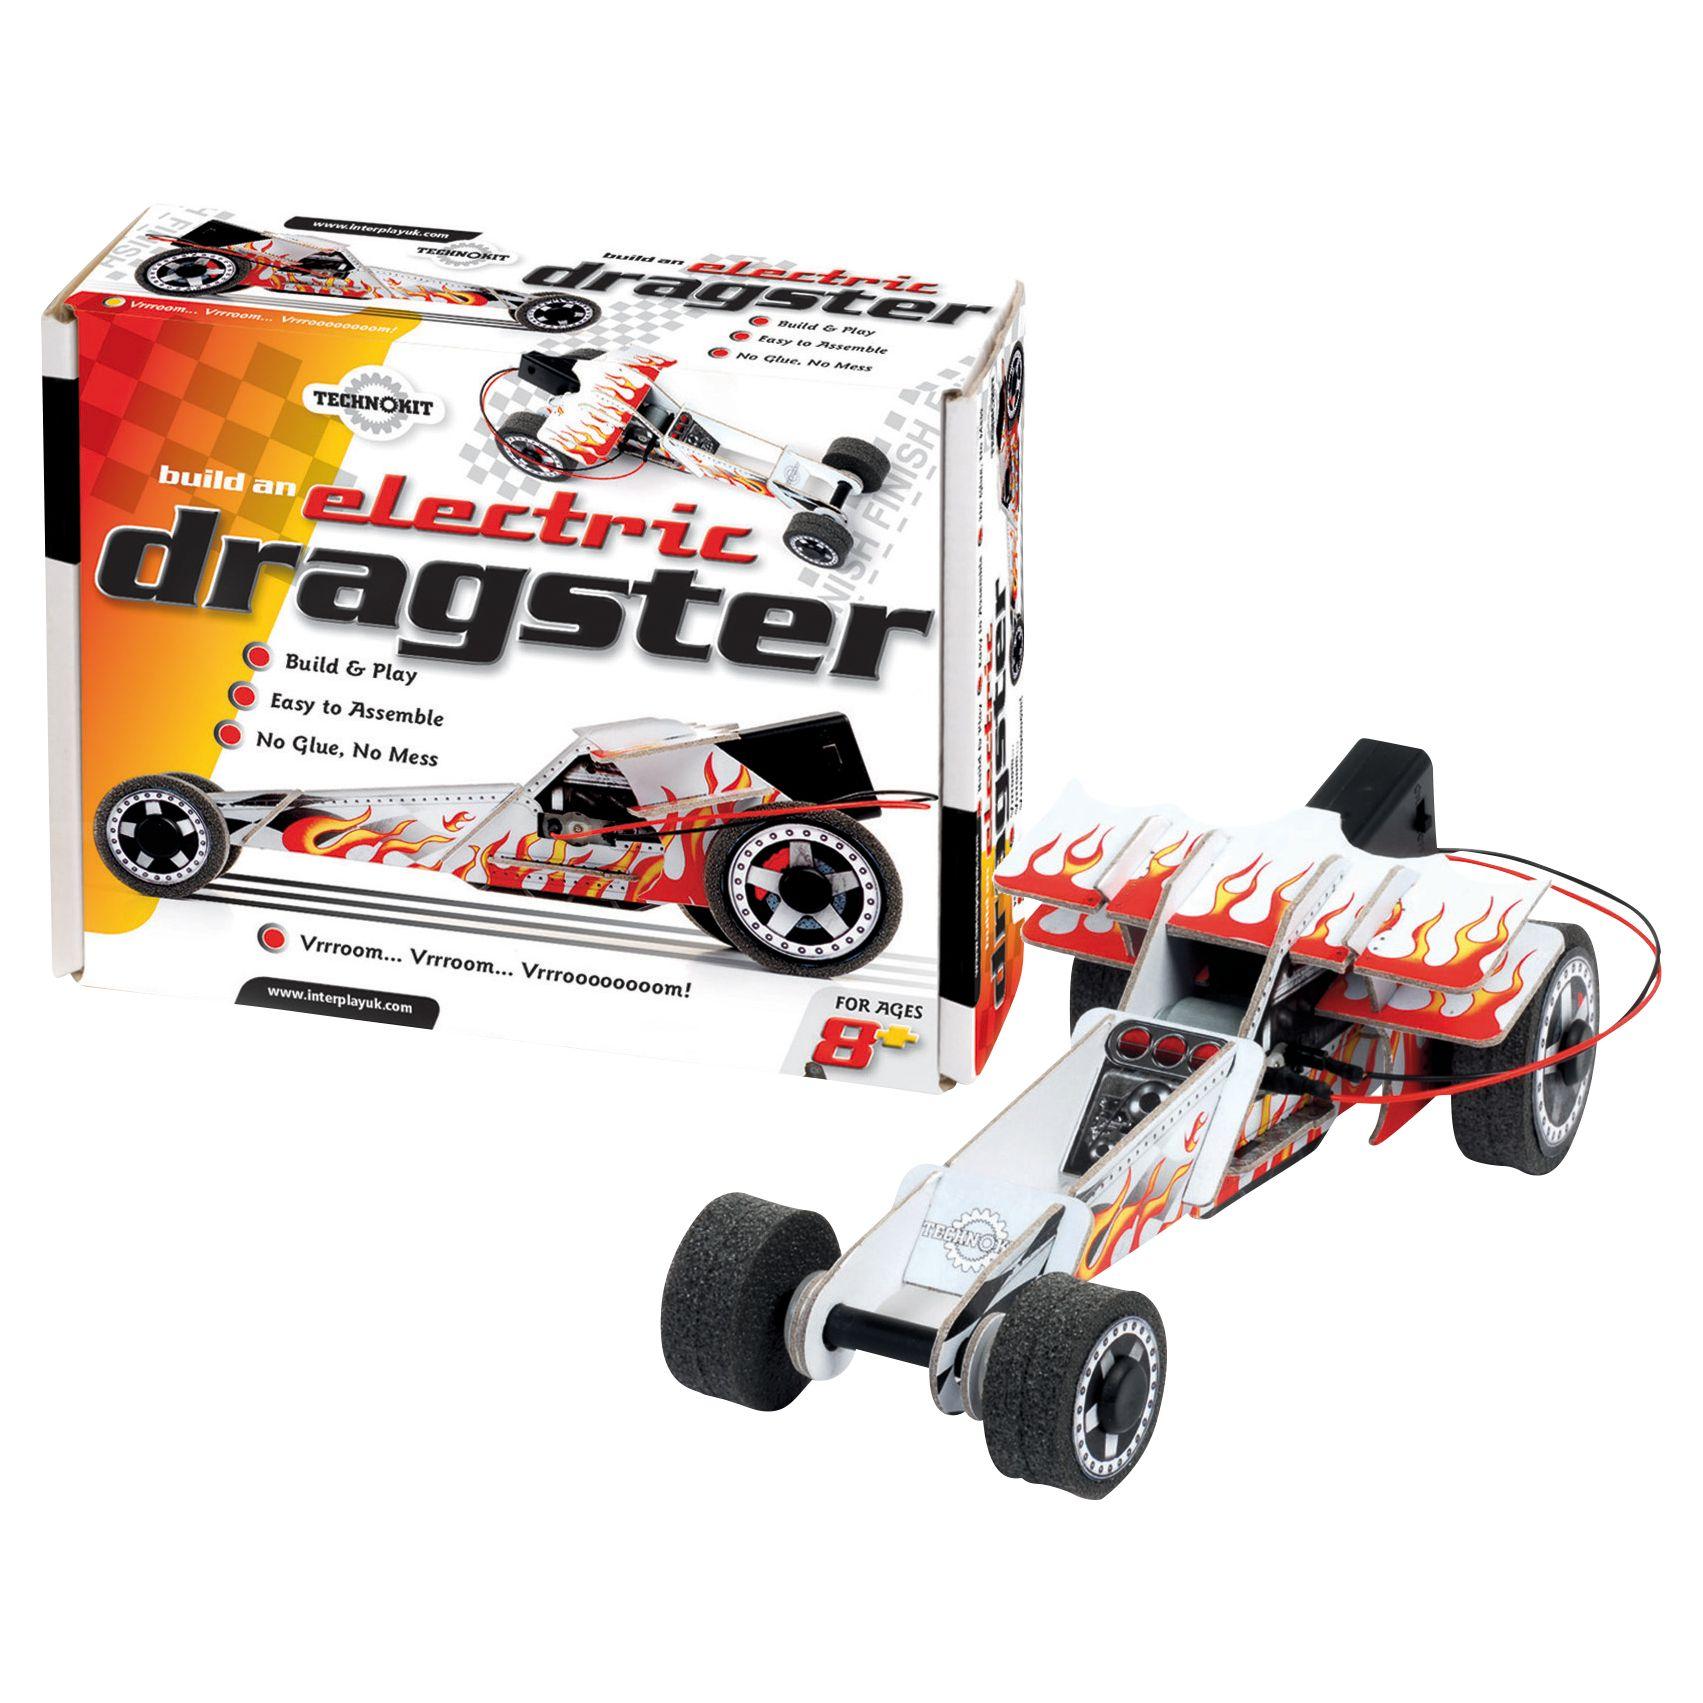 Technokit Technokit Electric Dragster Kit